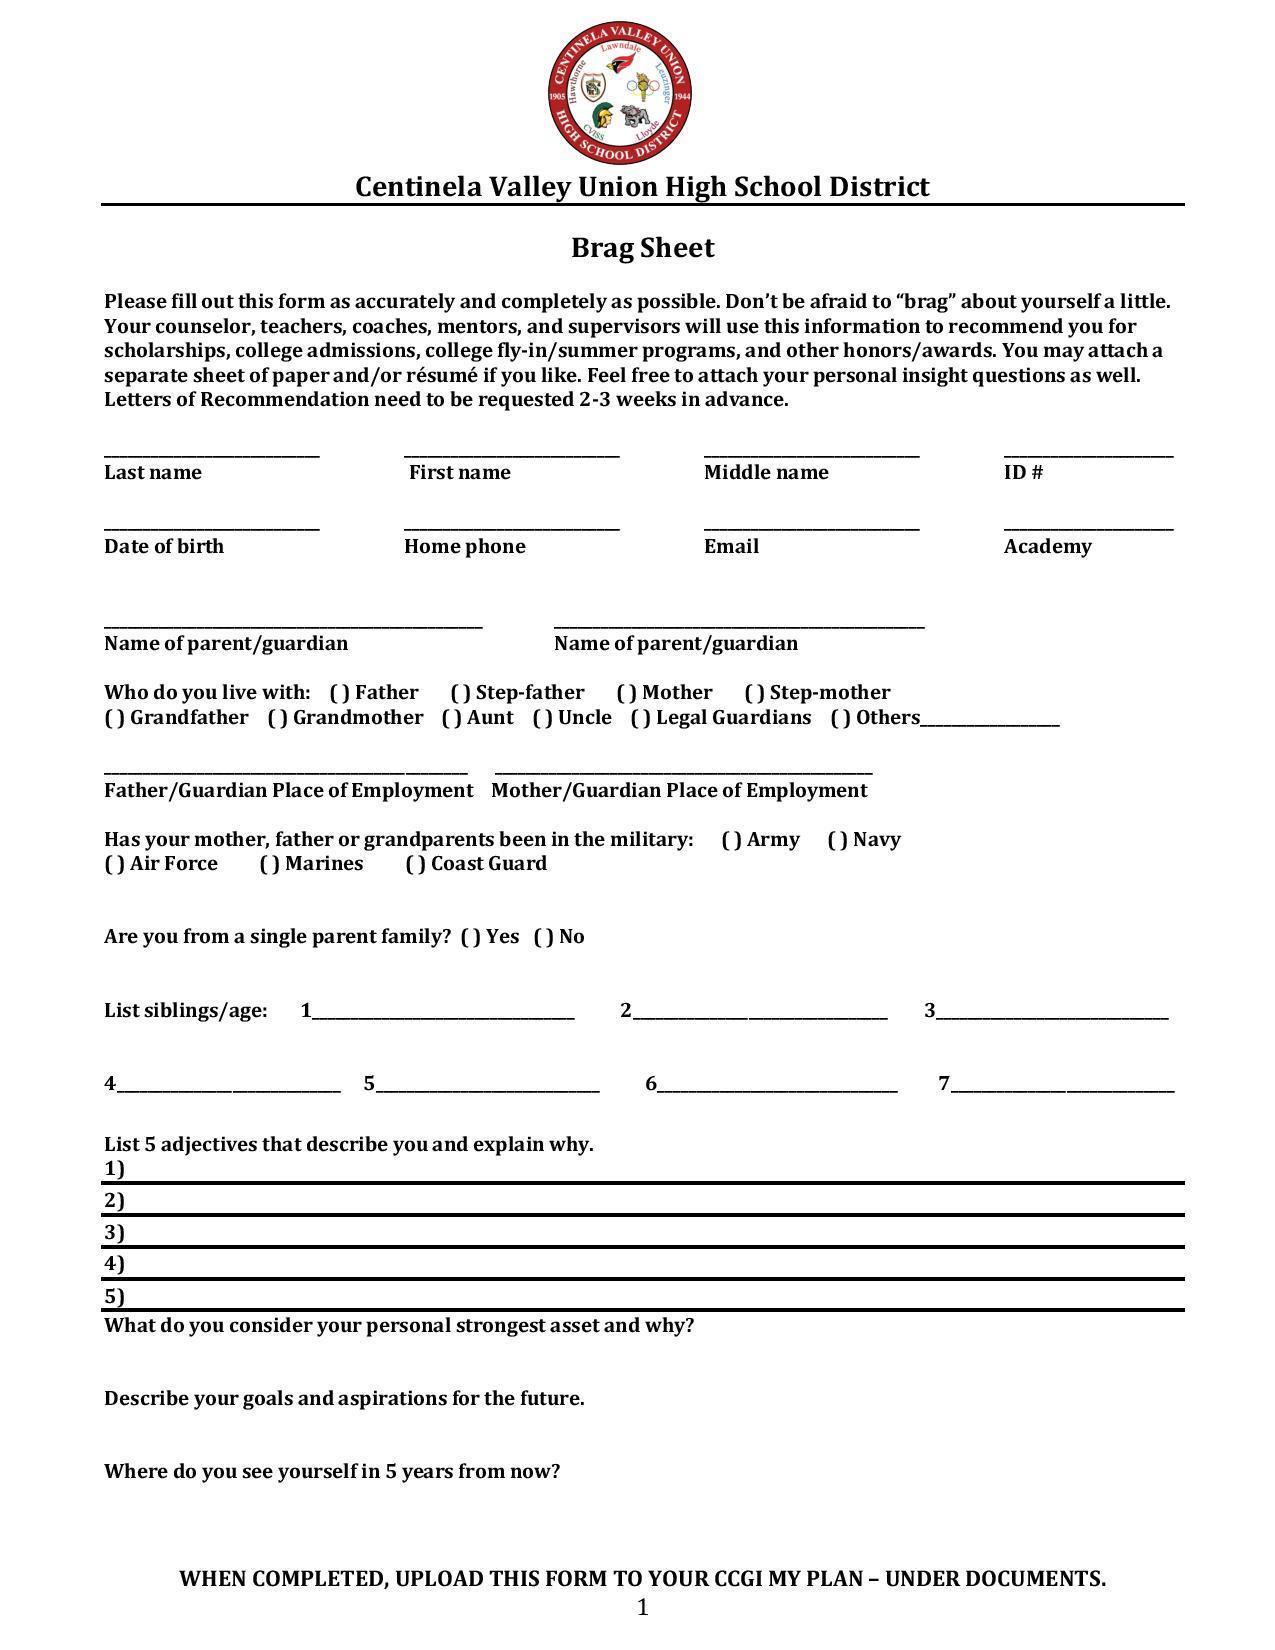 Brag Sheetletter Of Rec Counseling Lawndale High School